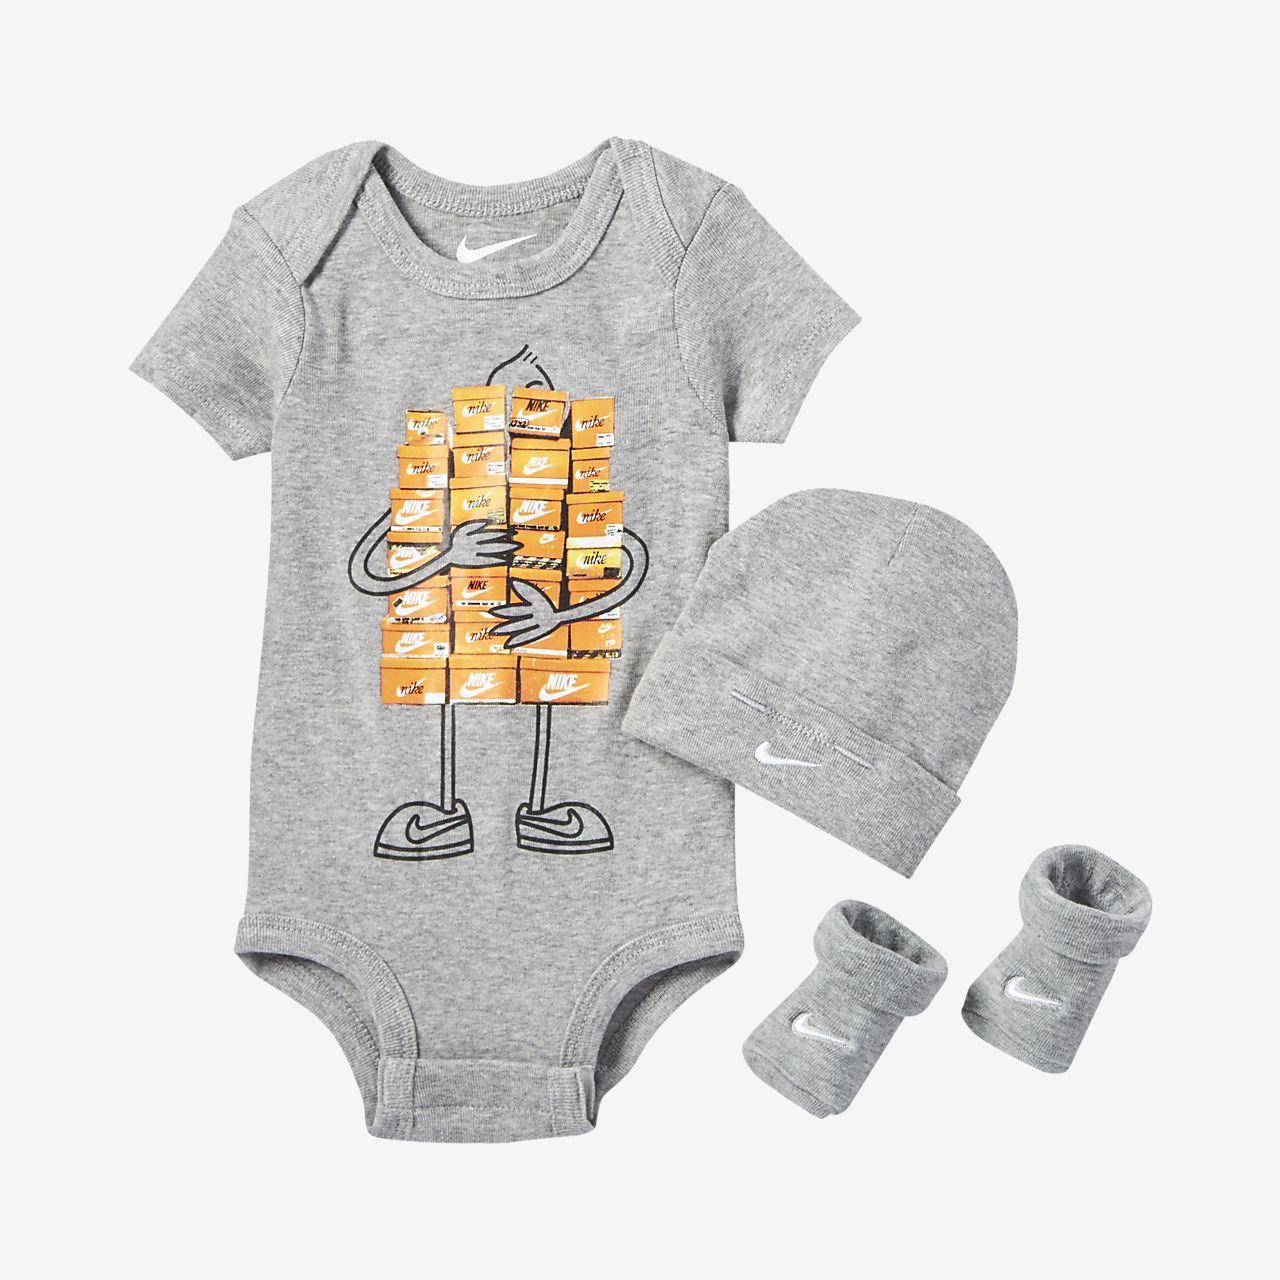 Nike Sneaker Spree Infant/Toddler Three-Piece Set